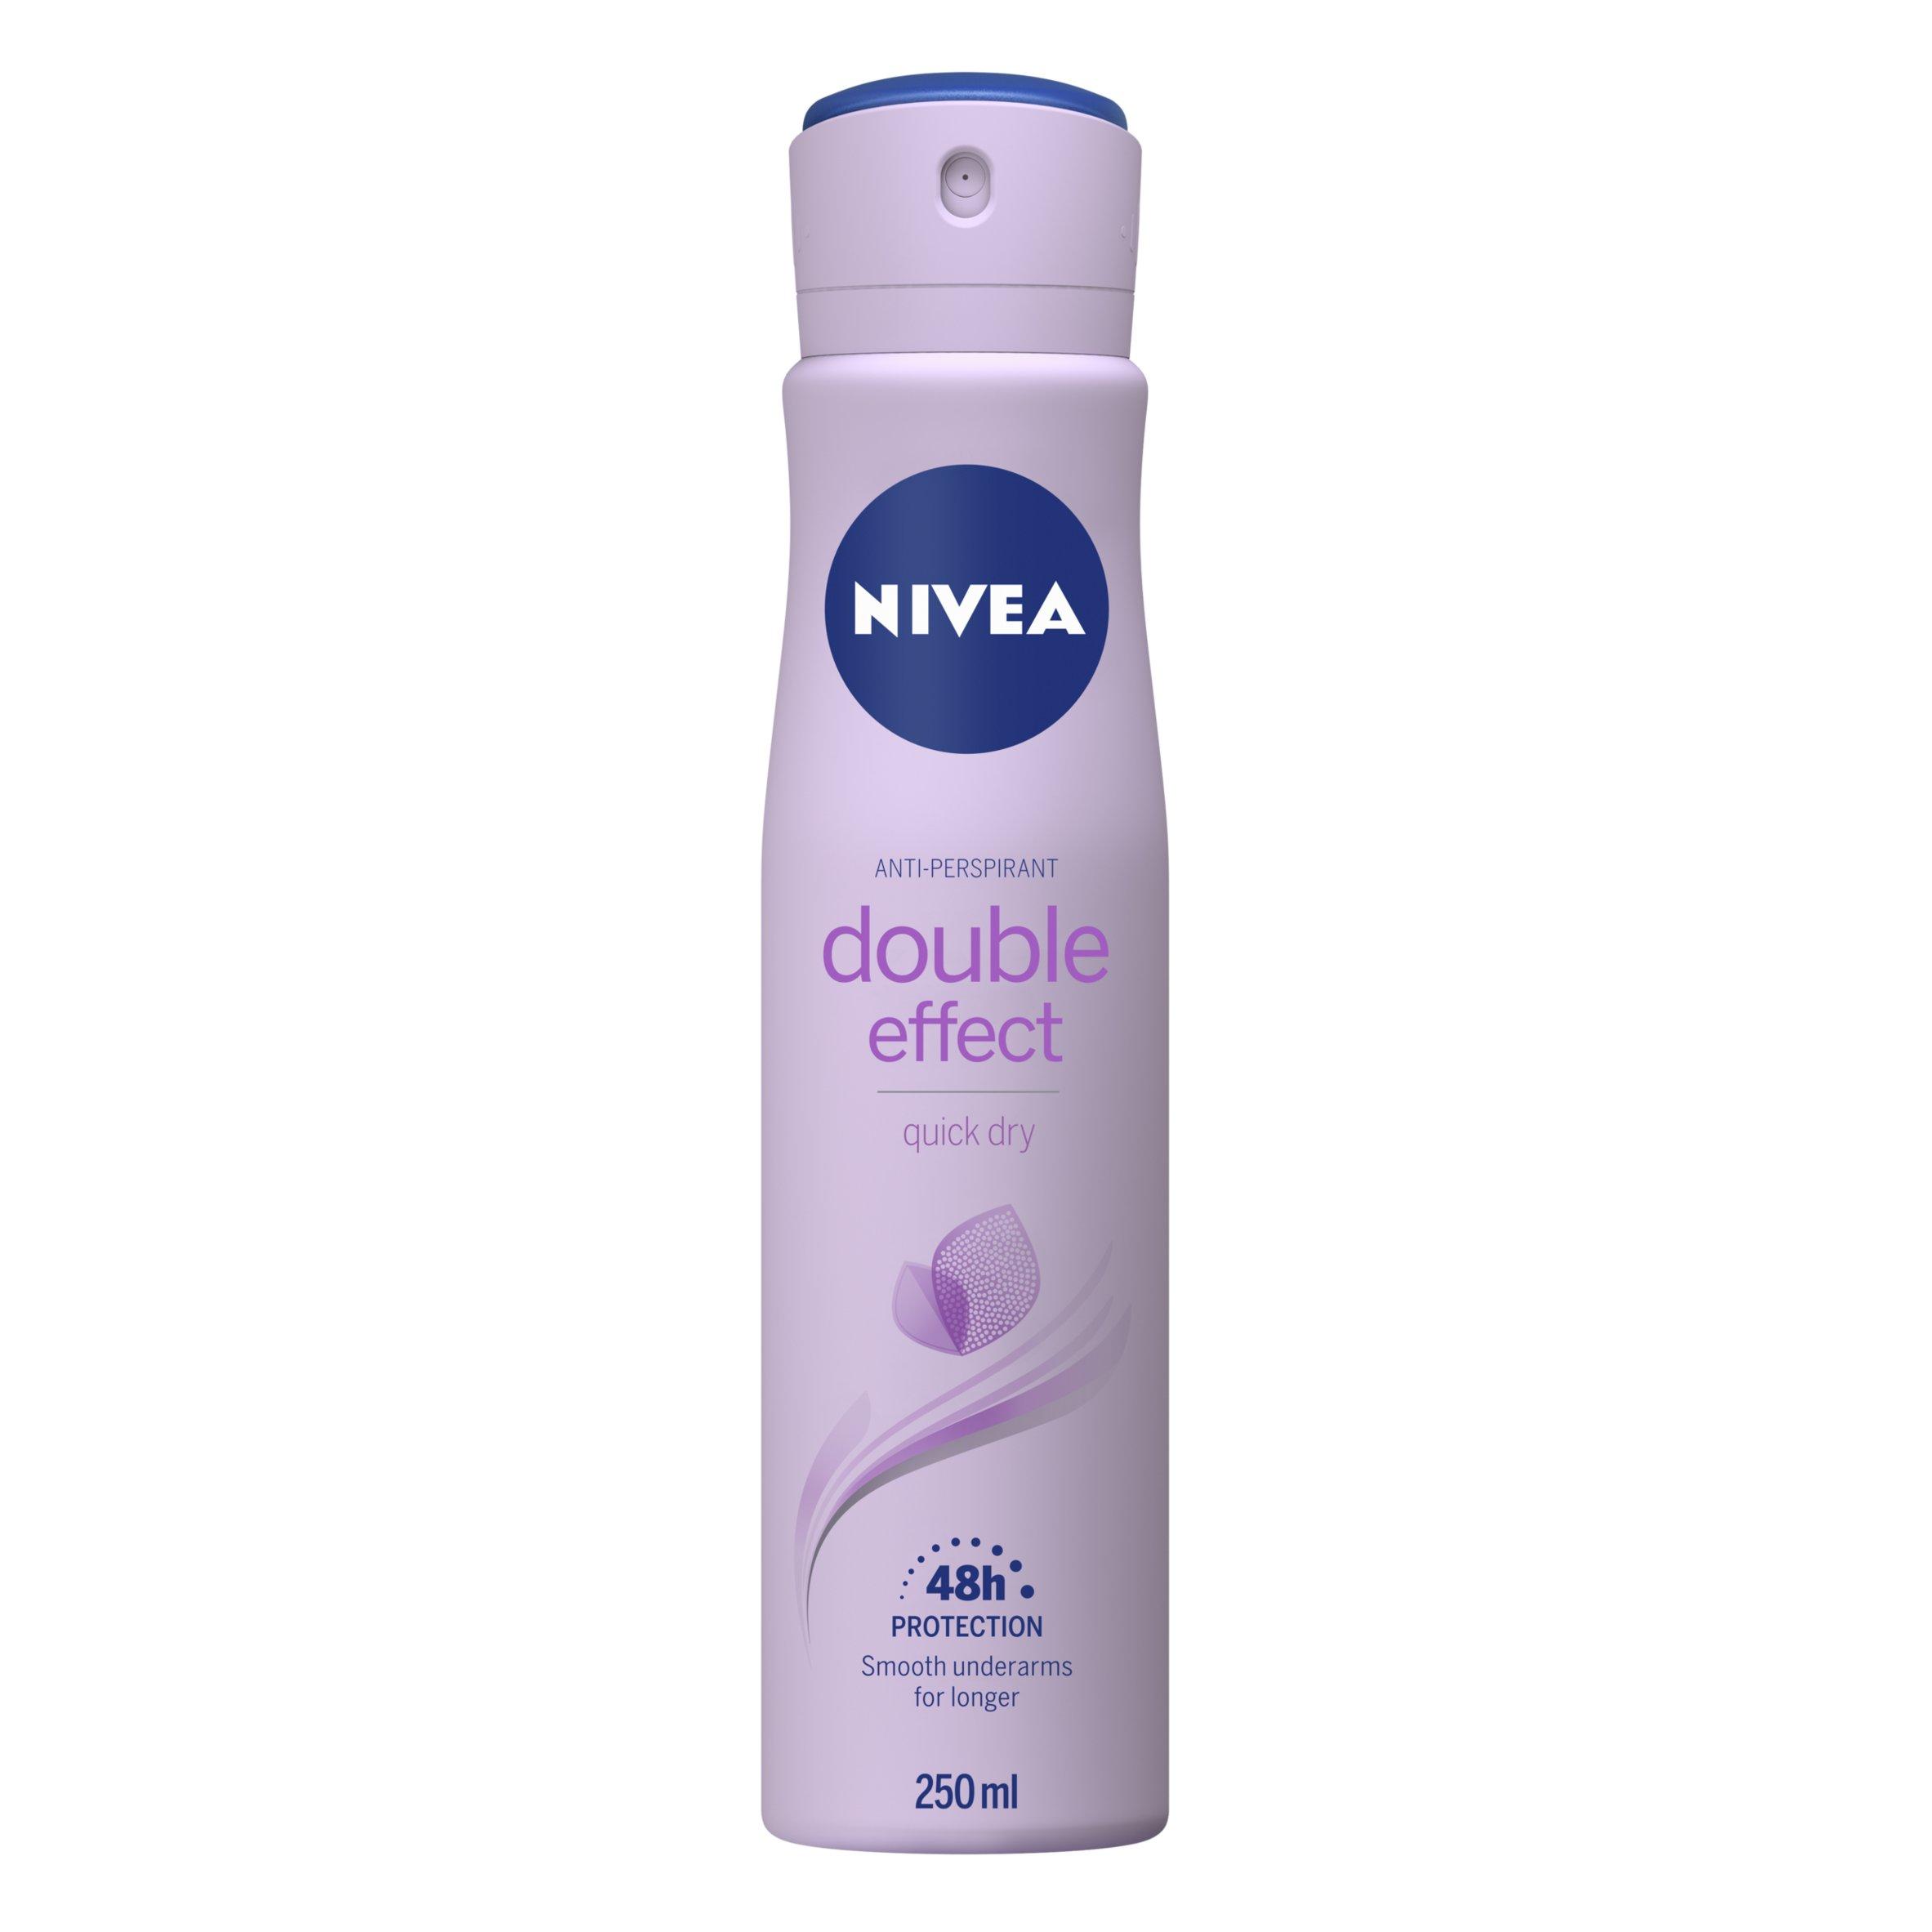 Nivea Double Effect Antiperspirant Deodorant 250Ml